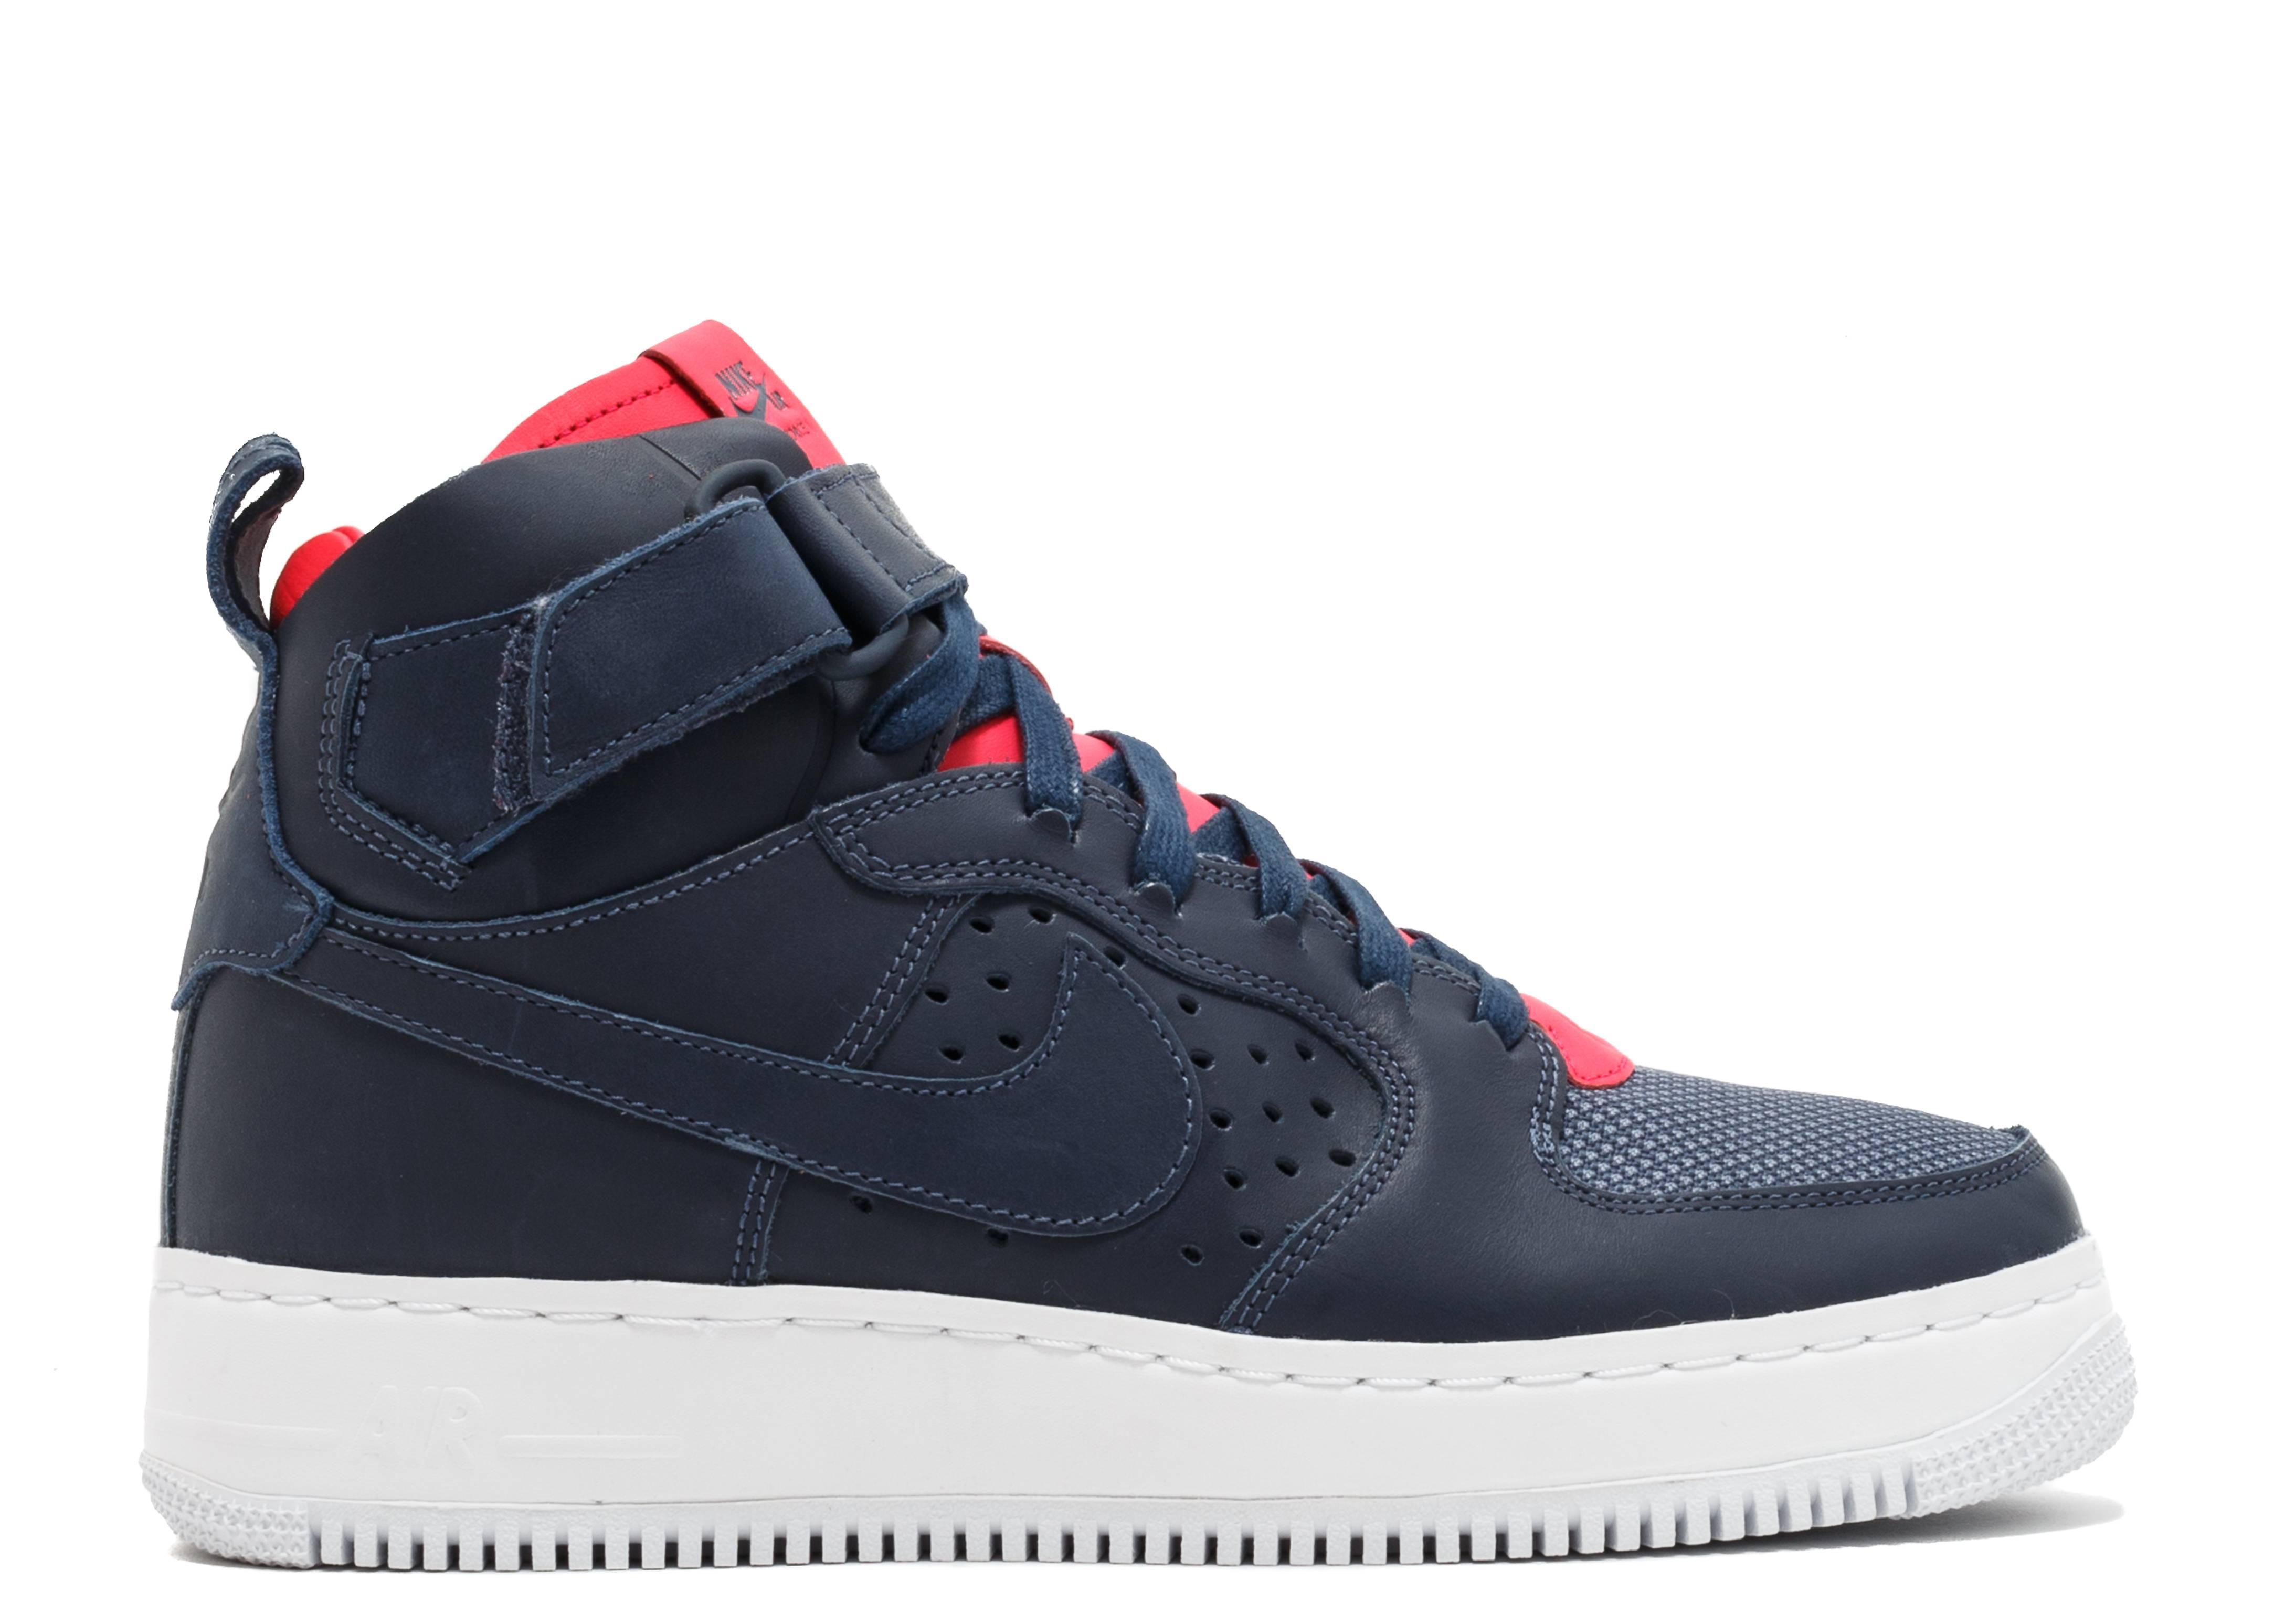 sports shoes 57770 a1002 nike. NIKELAB AIR FORCE 1 HIGH CMFT TC SP